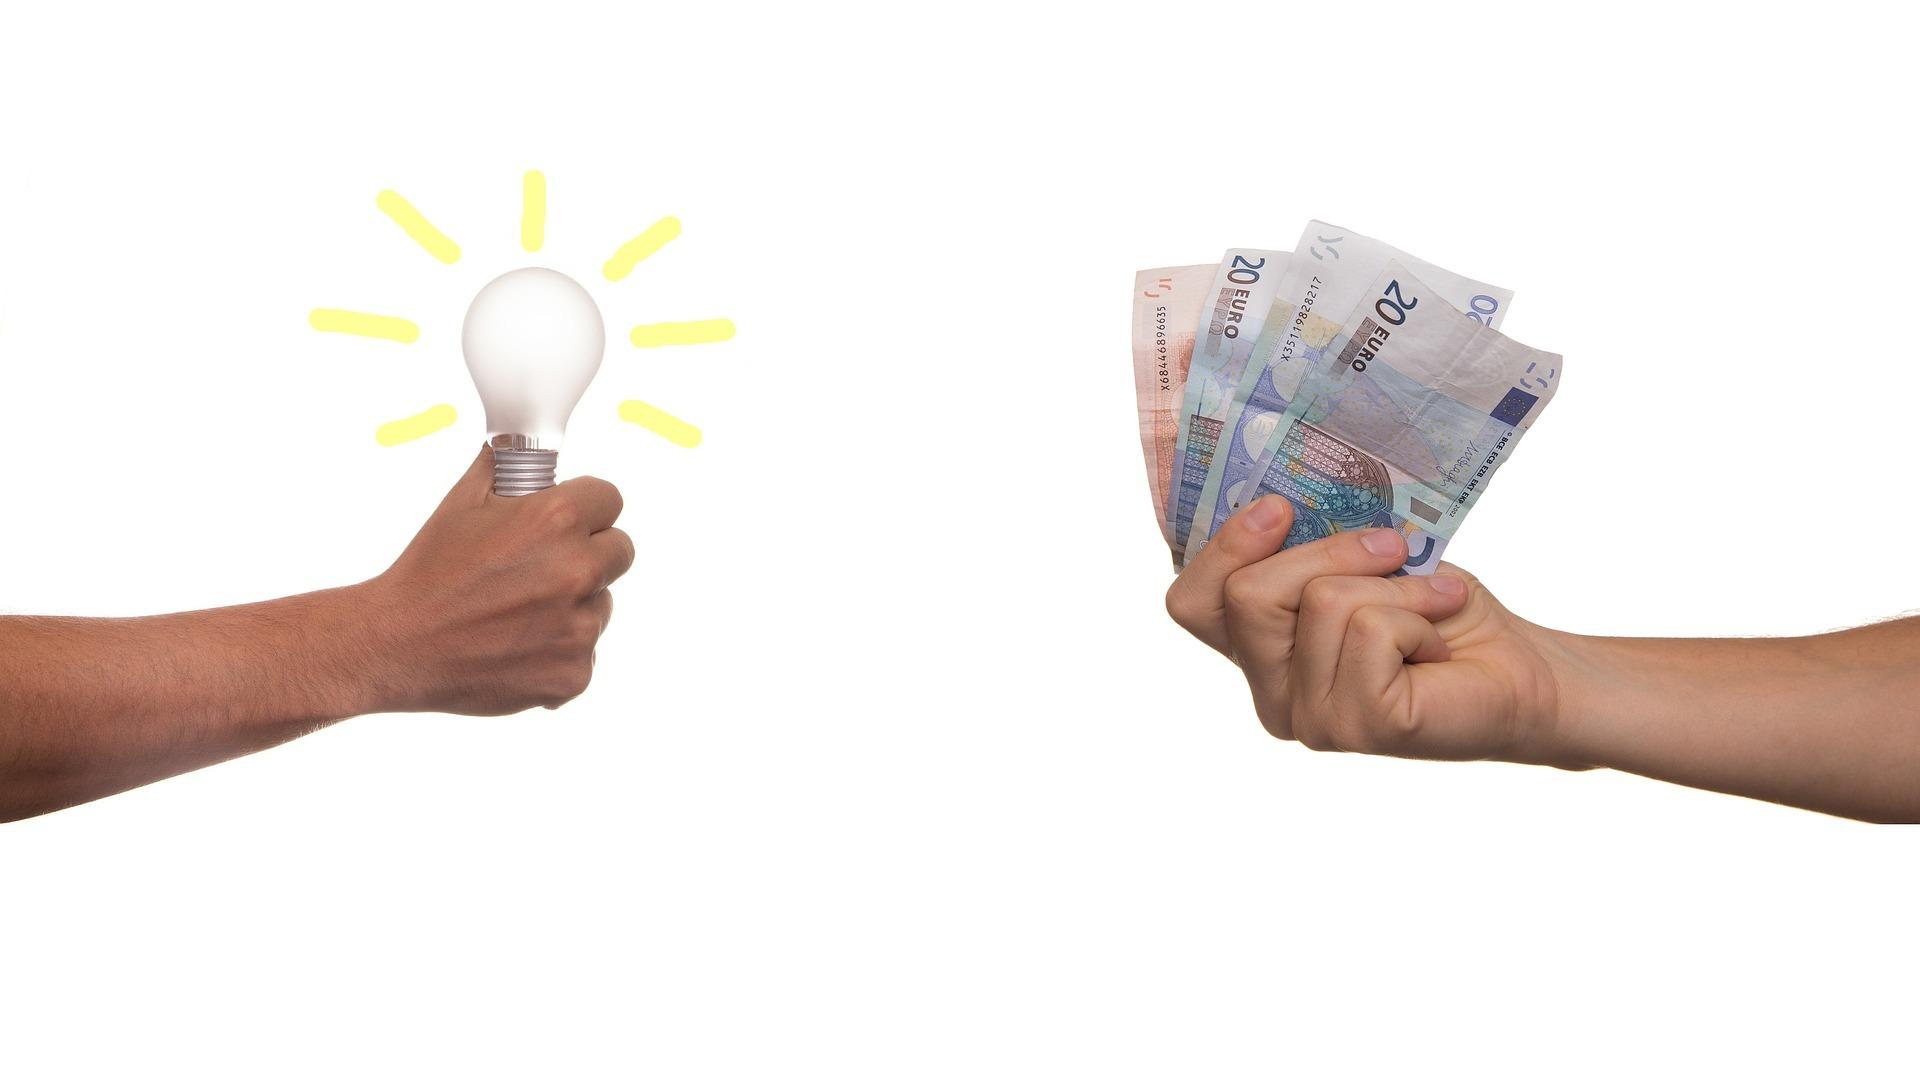 Franchise Idee & Geschäftsidee